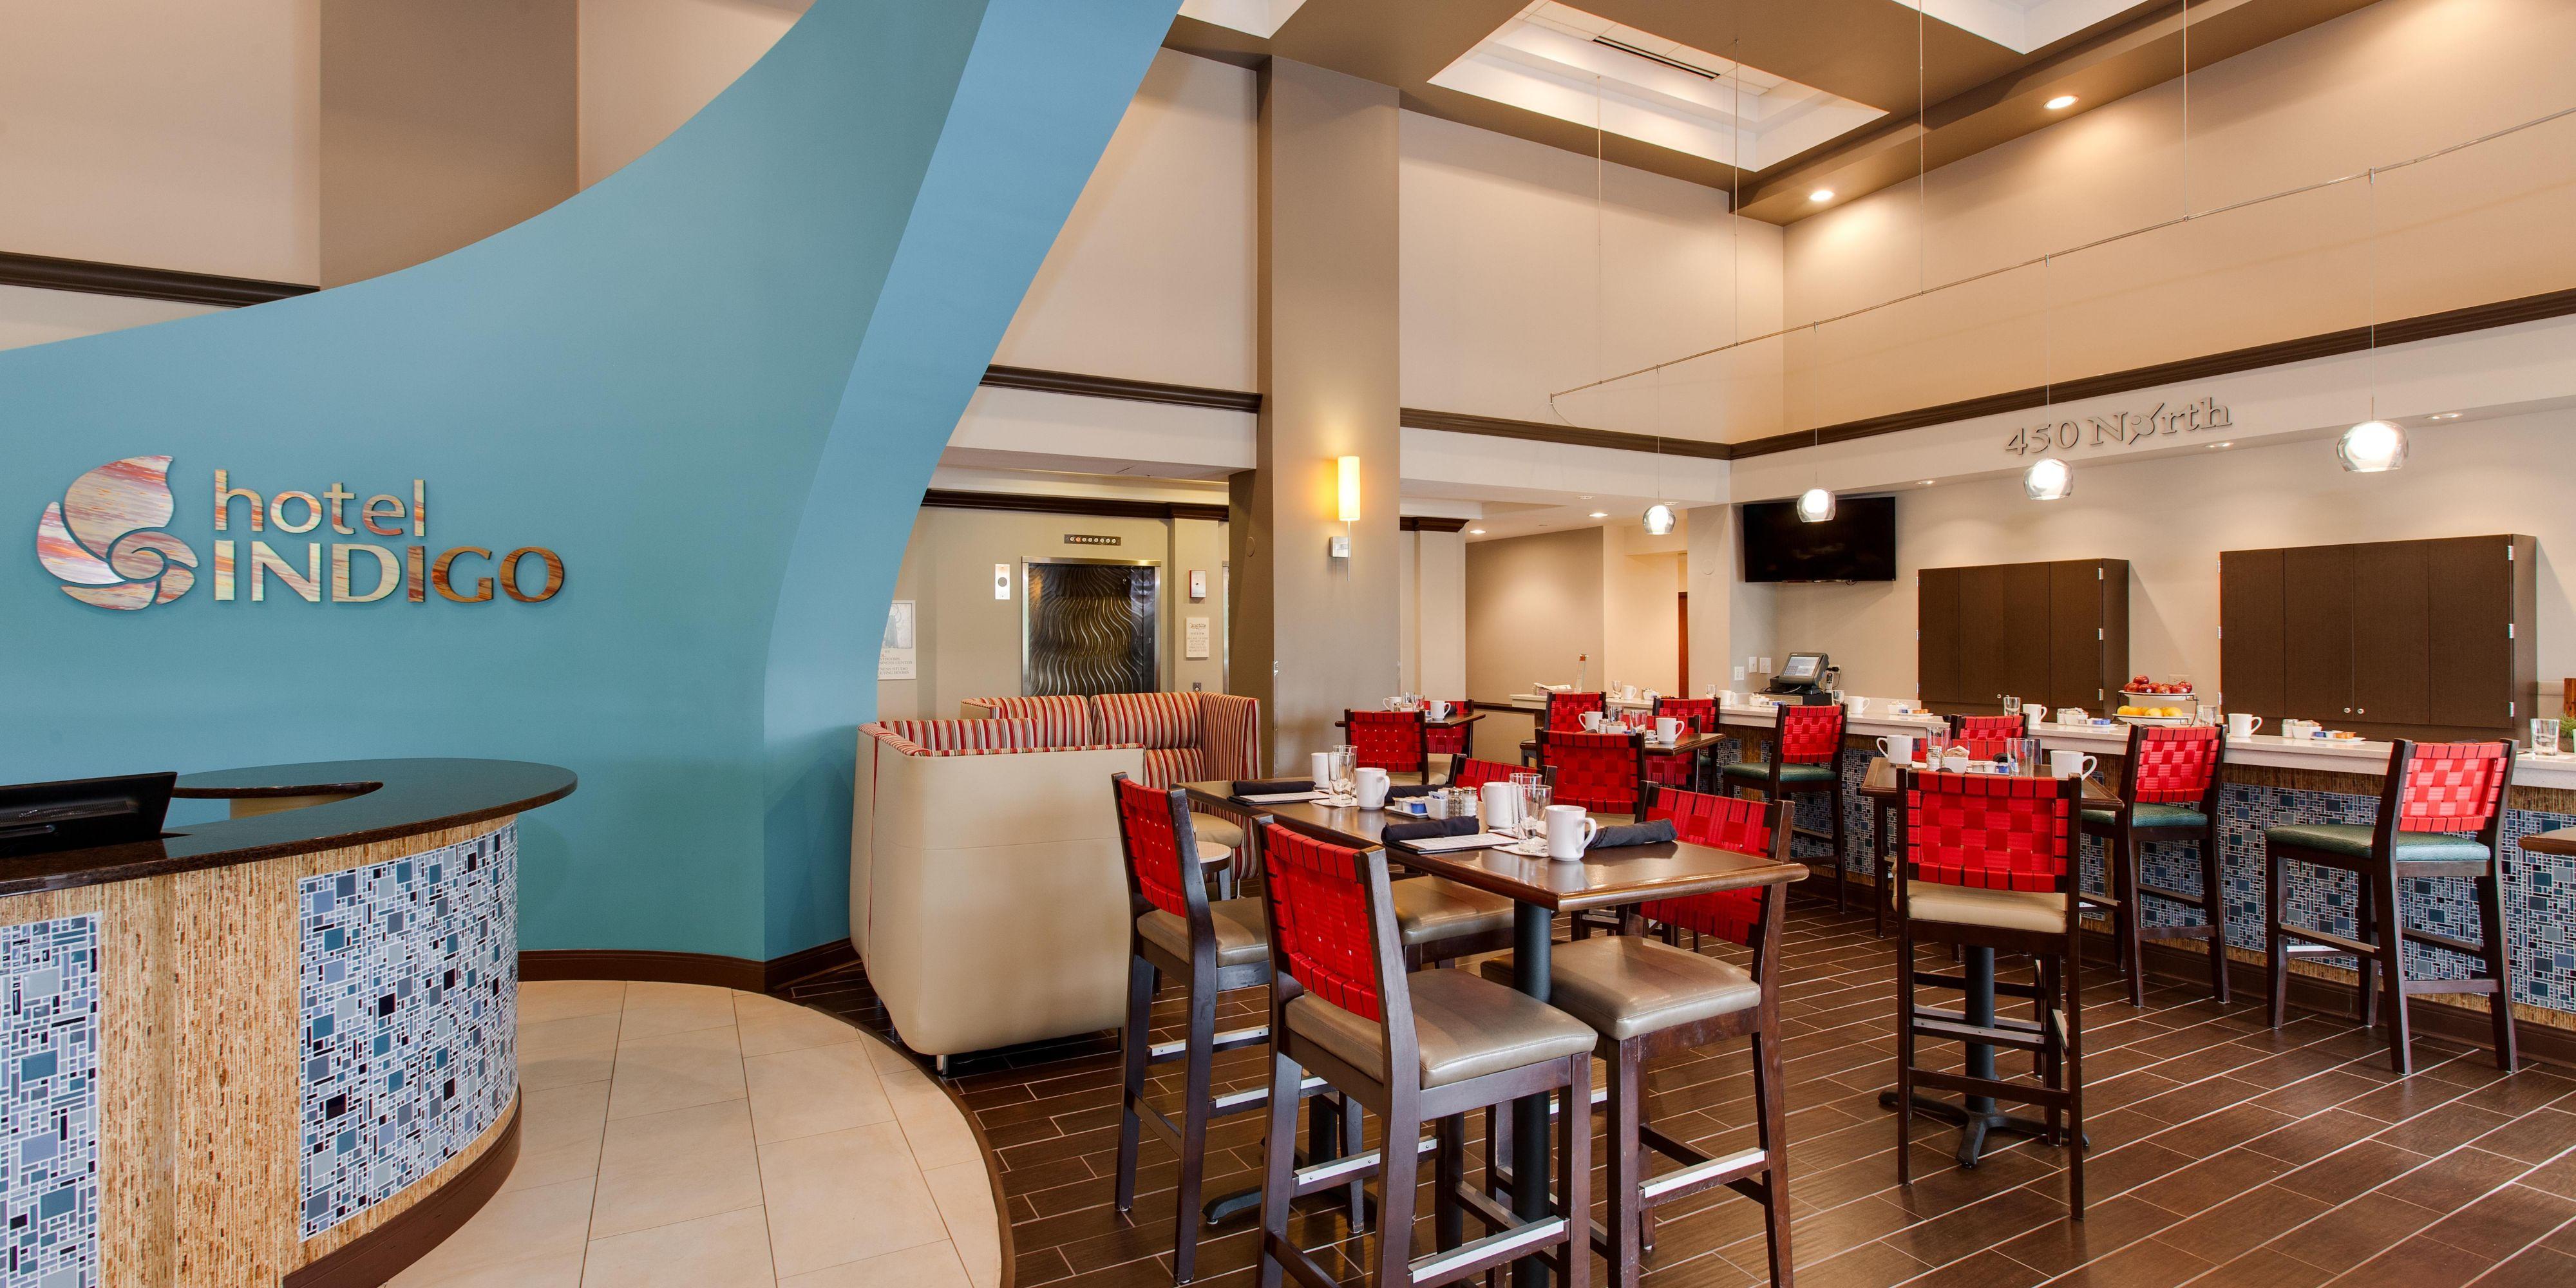 ... Upscale Warm Lobby Area; Welcome To Hotel Indigo Vernon Hills ...